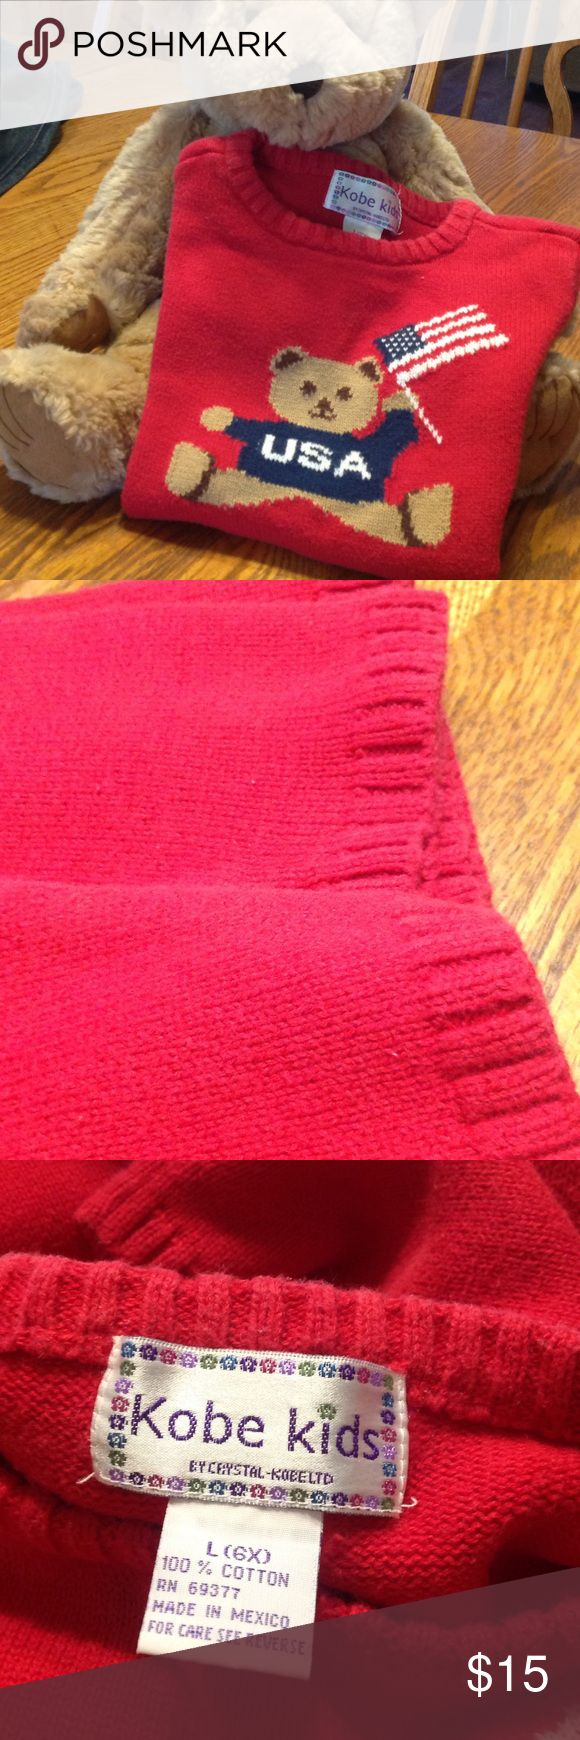 KOBE KIDS Good used condition slight pilling from washing kobe kids Shirts & Tops Sweaters